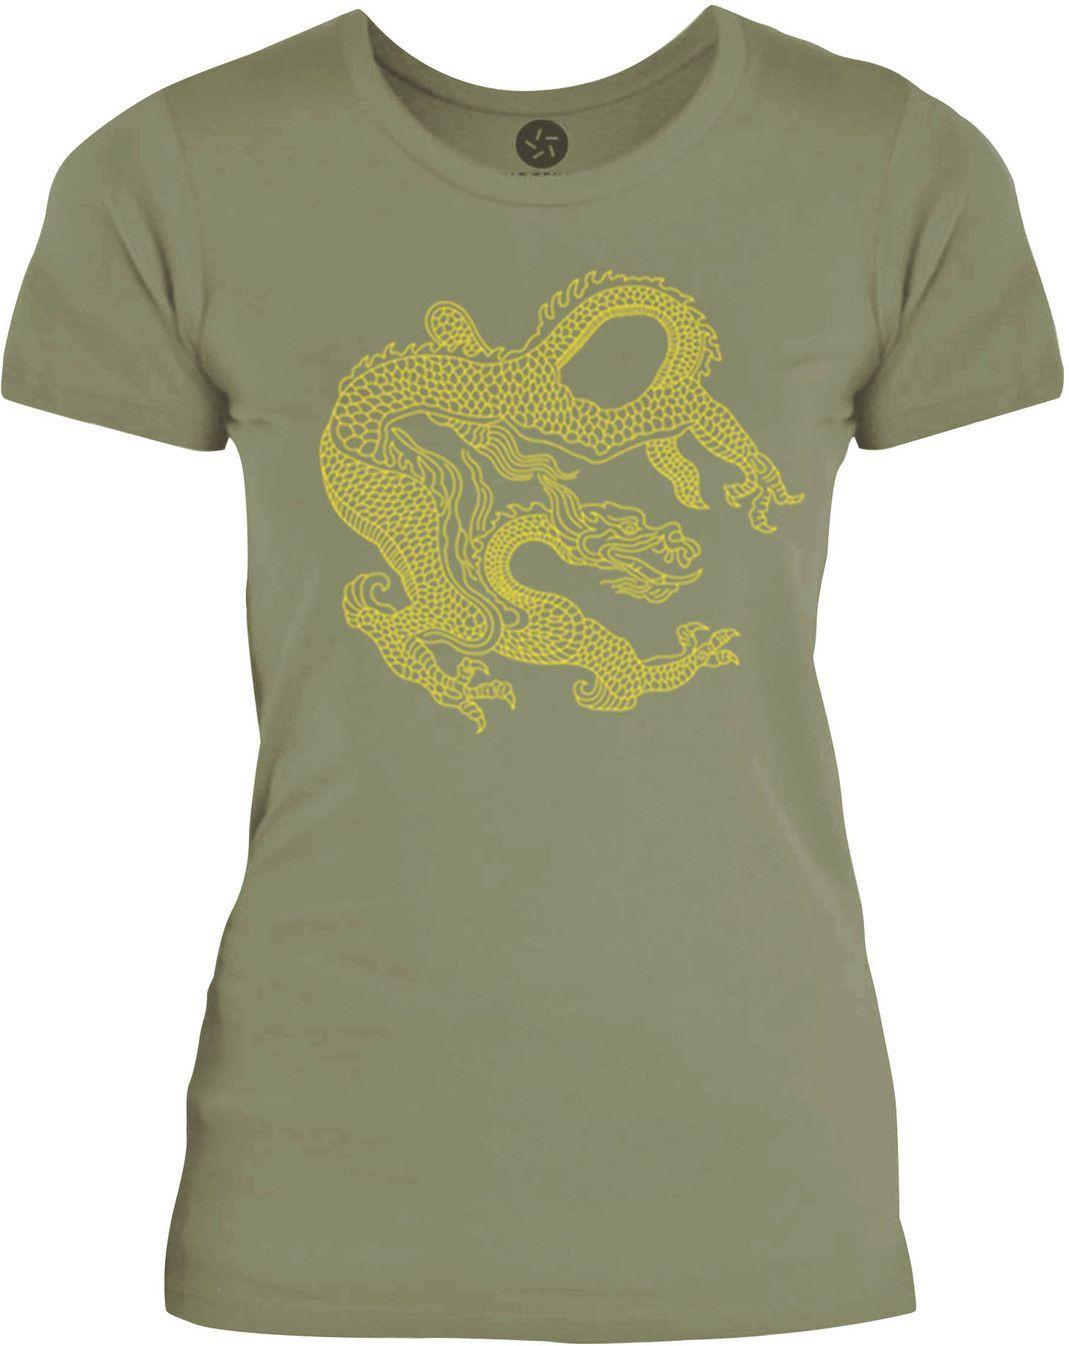 Big Texas Eastern Dragon (Yellow) Womens Fine Jersey T-Shirt